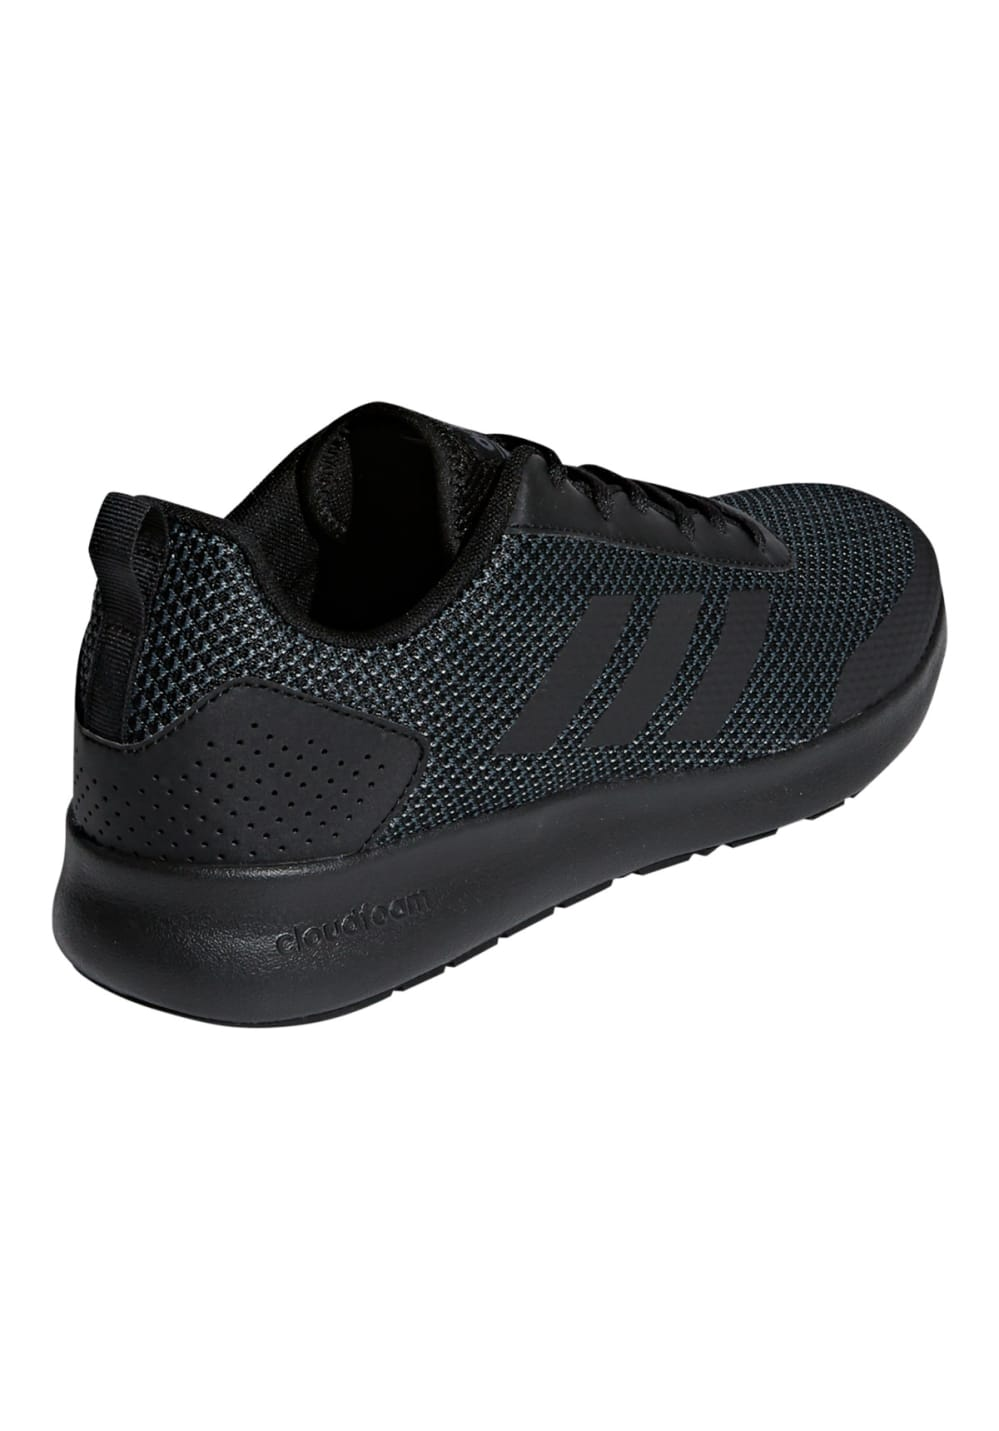 the latest 554da 75d16 adidas ELEMENT RACE - Running shoes for Men - Black